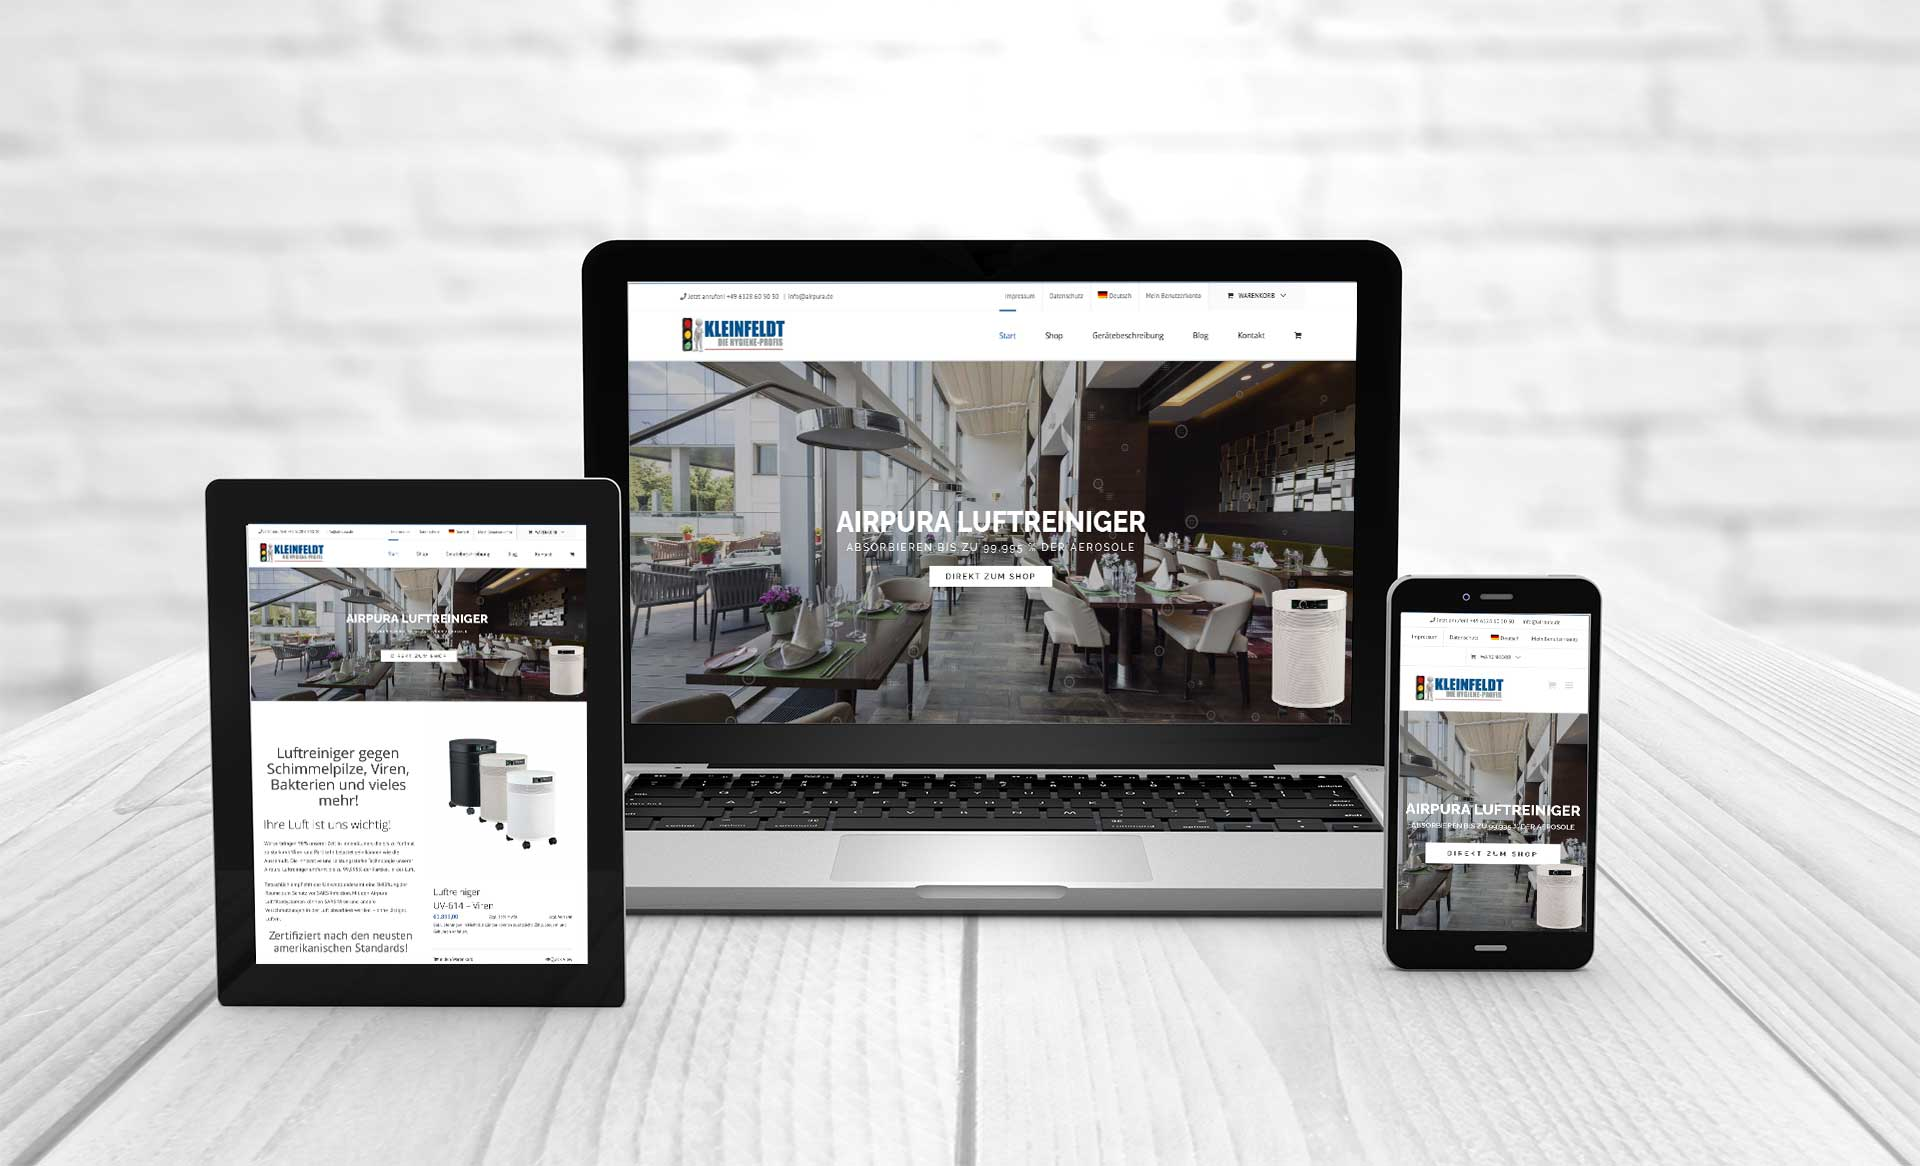 Professional web design, room air purifier, aerosol filter Airpura